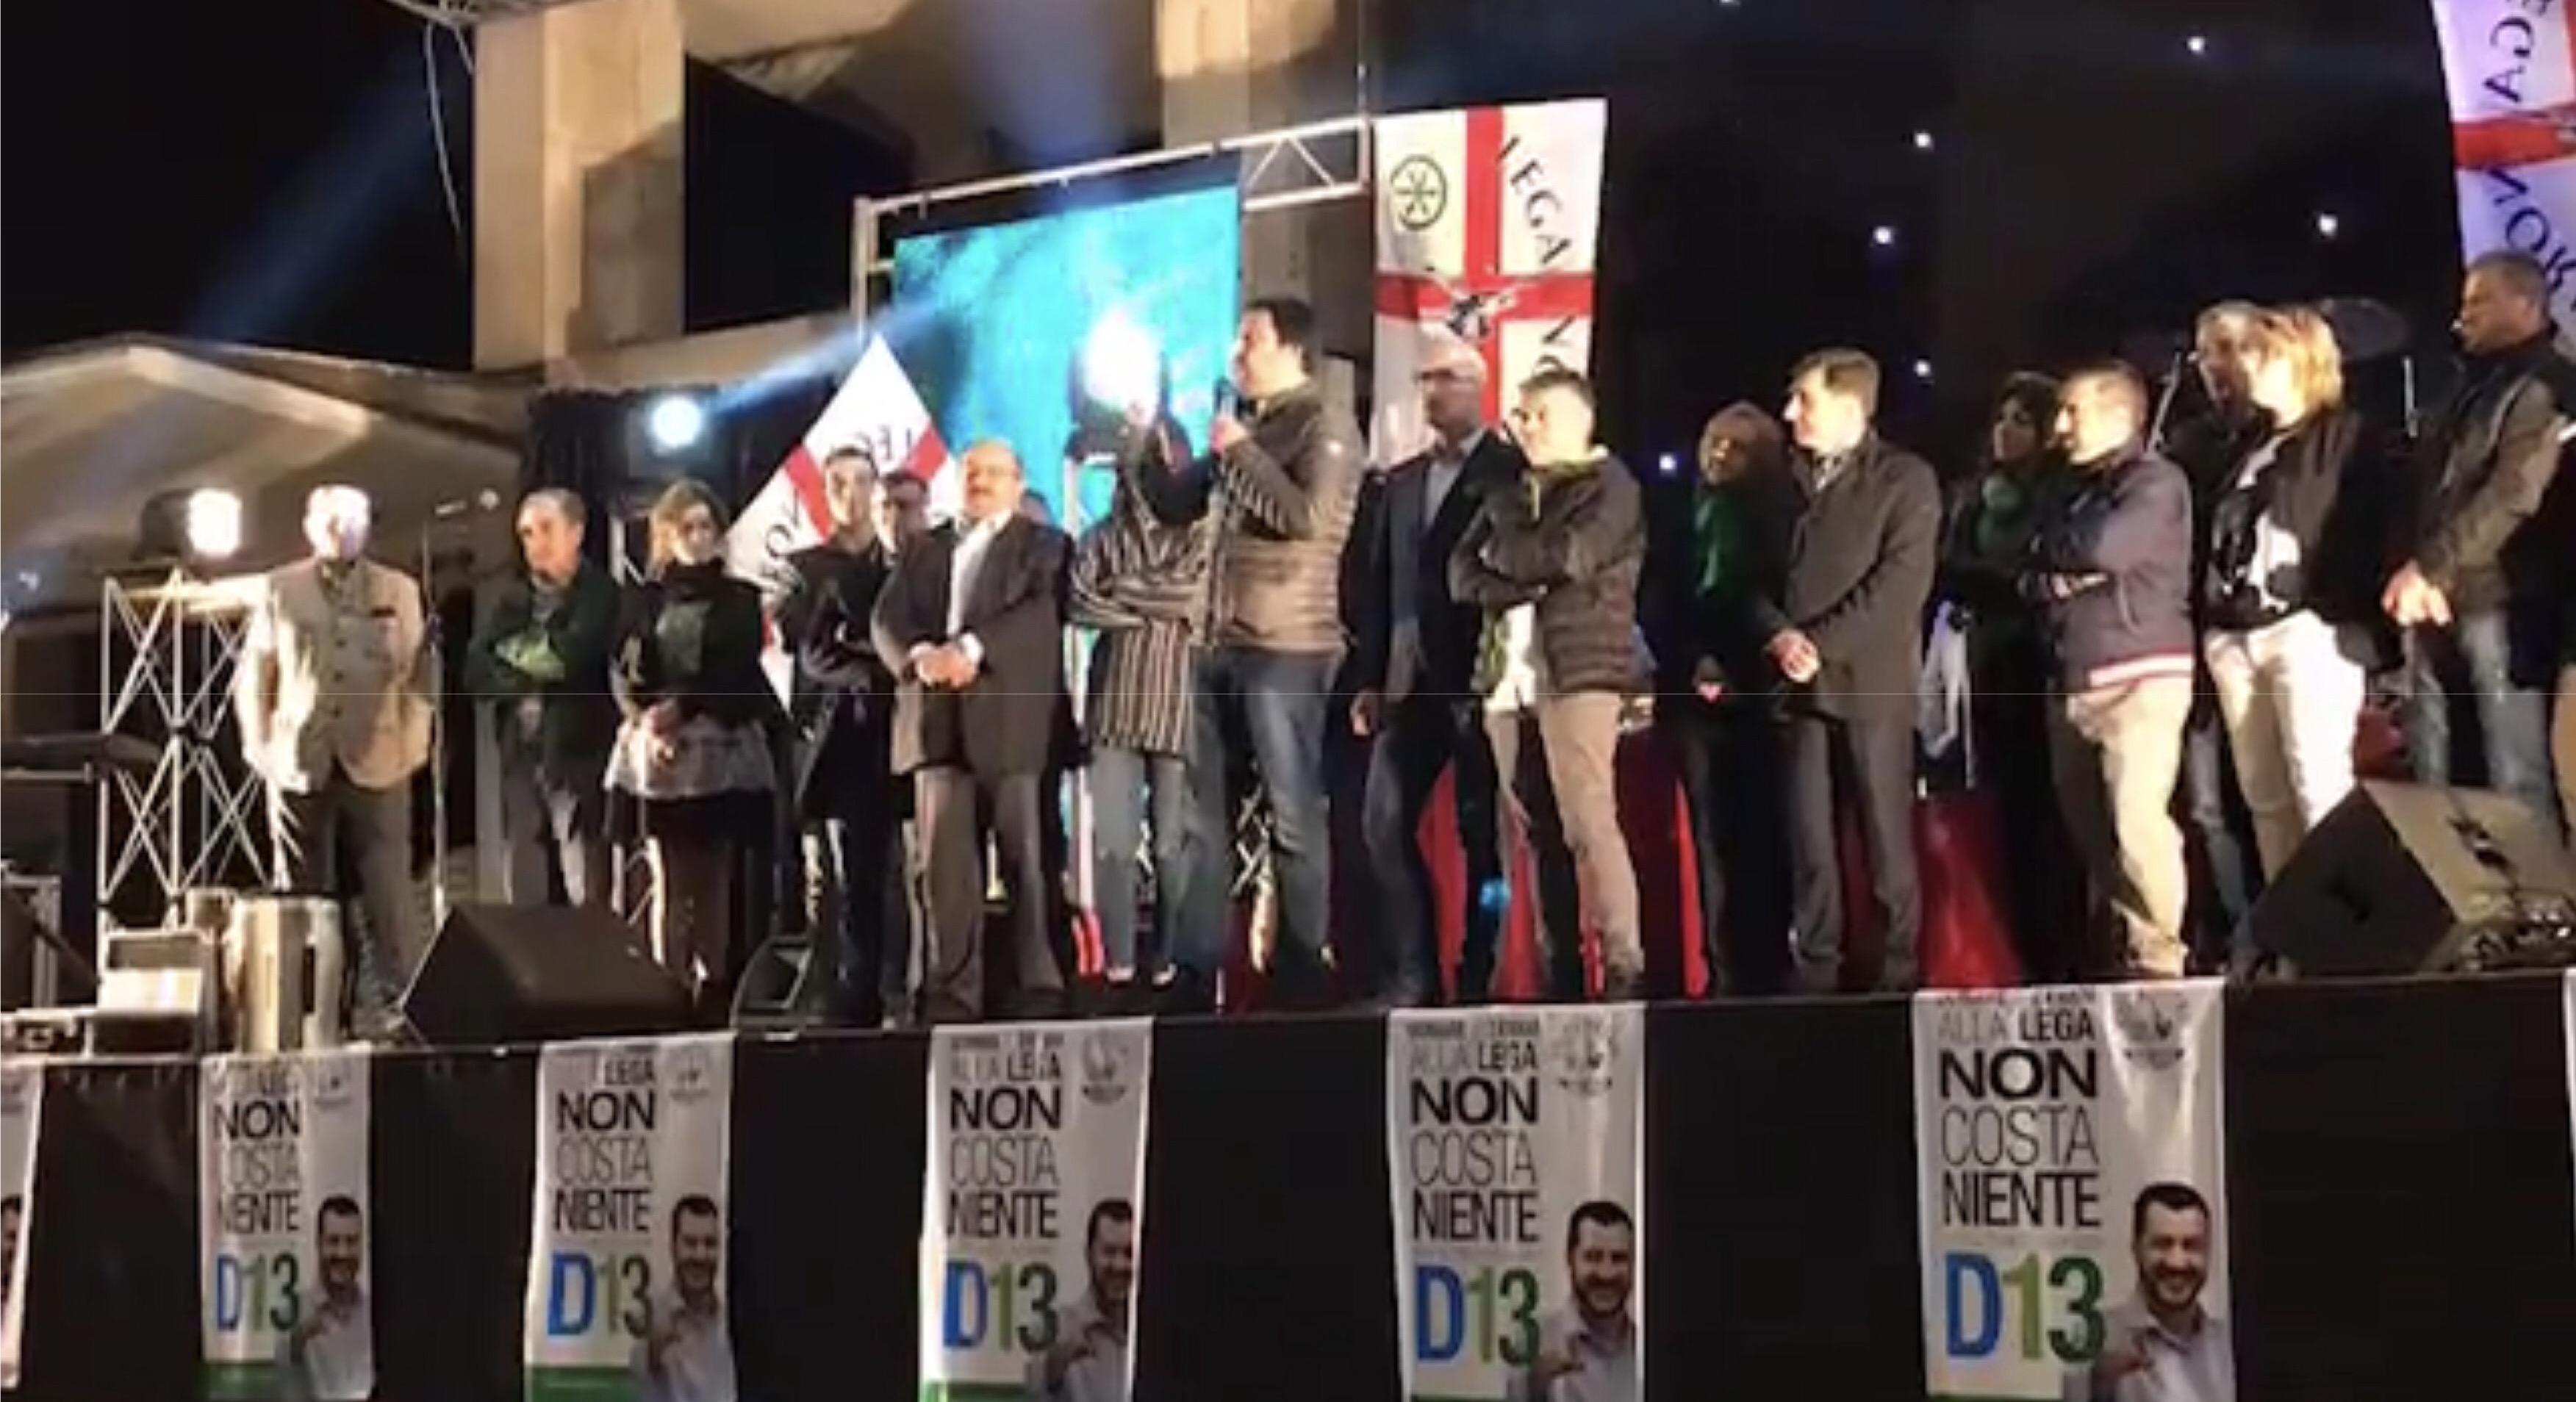 Borghesi Salvini Darfo